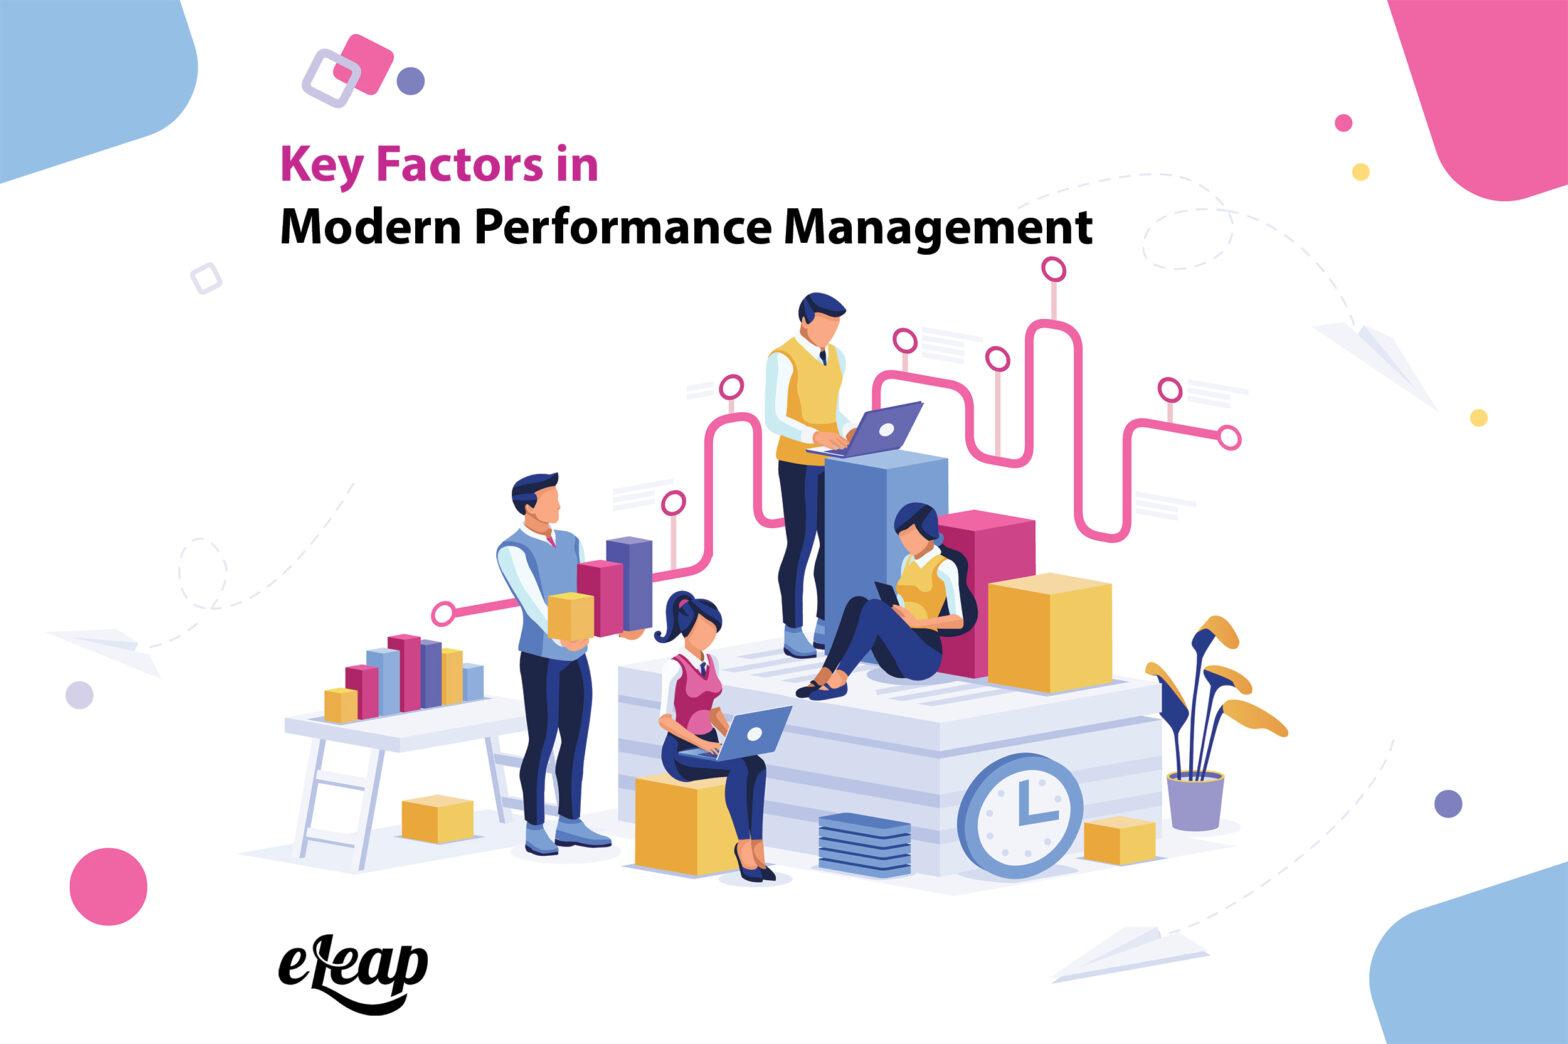 Key Factors in Modern Performance Management